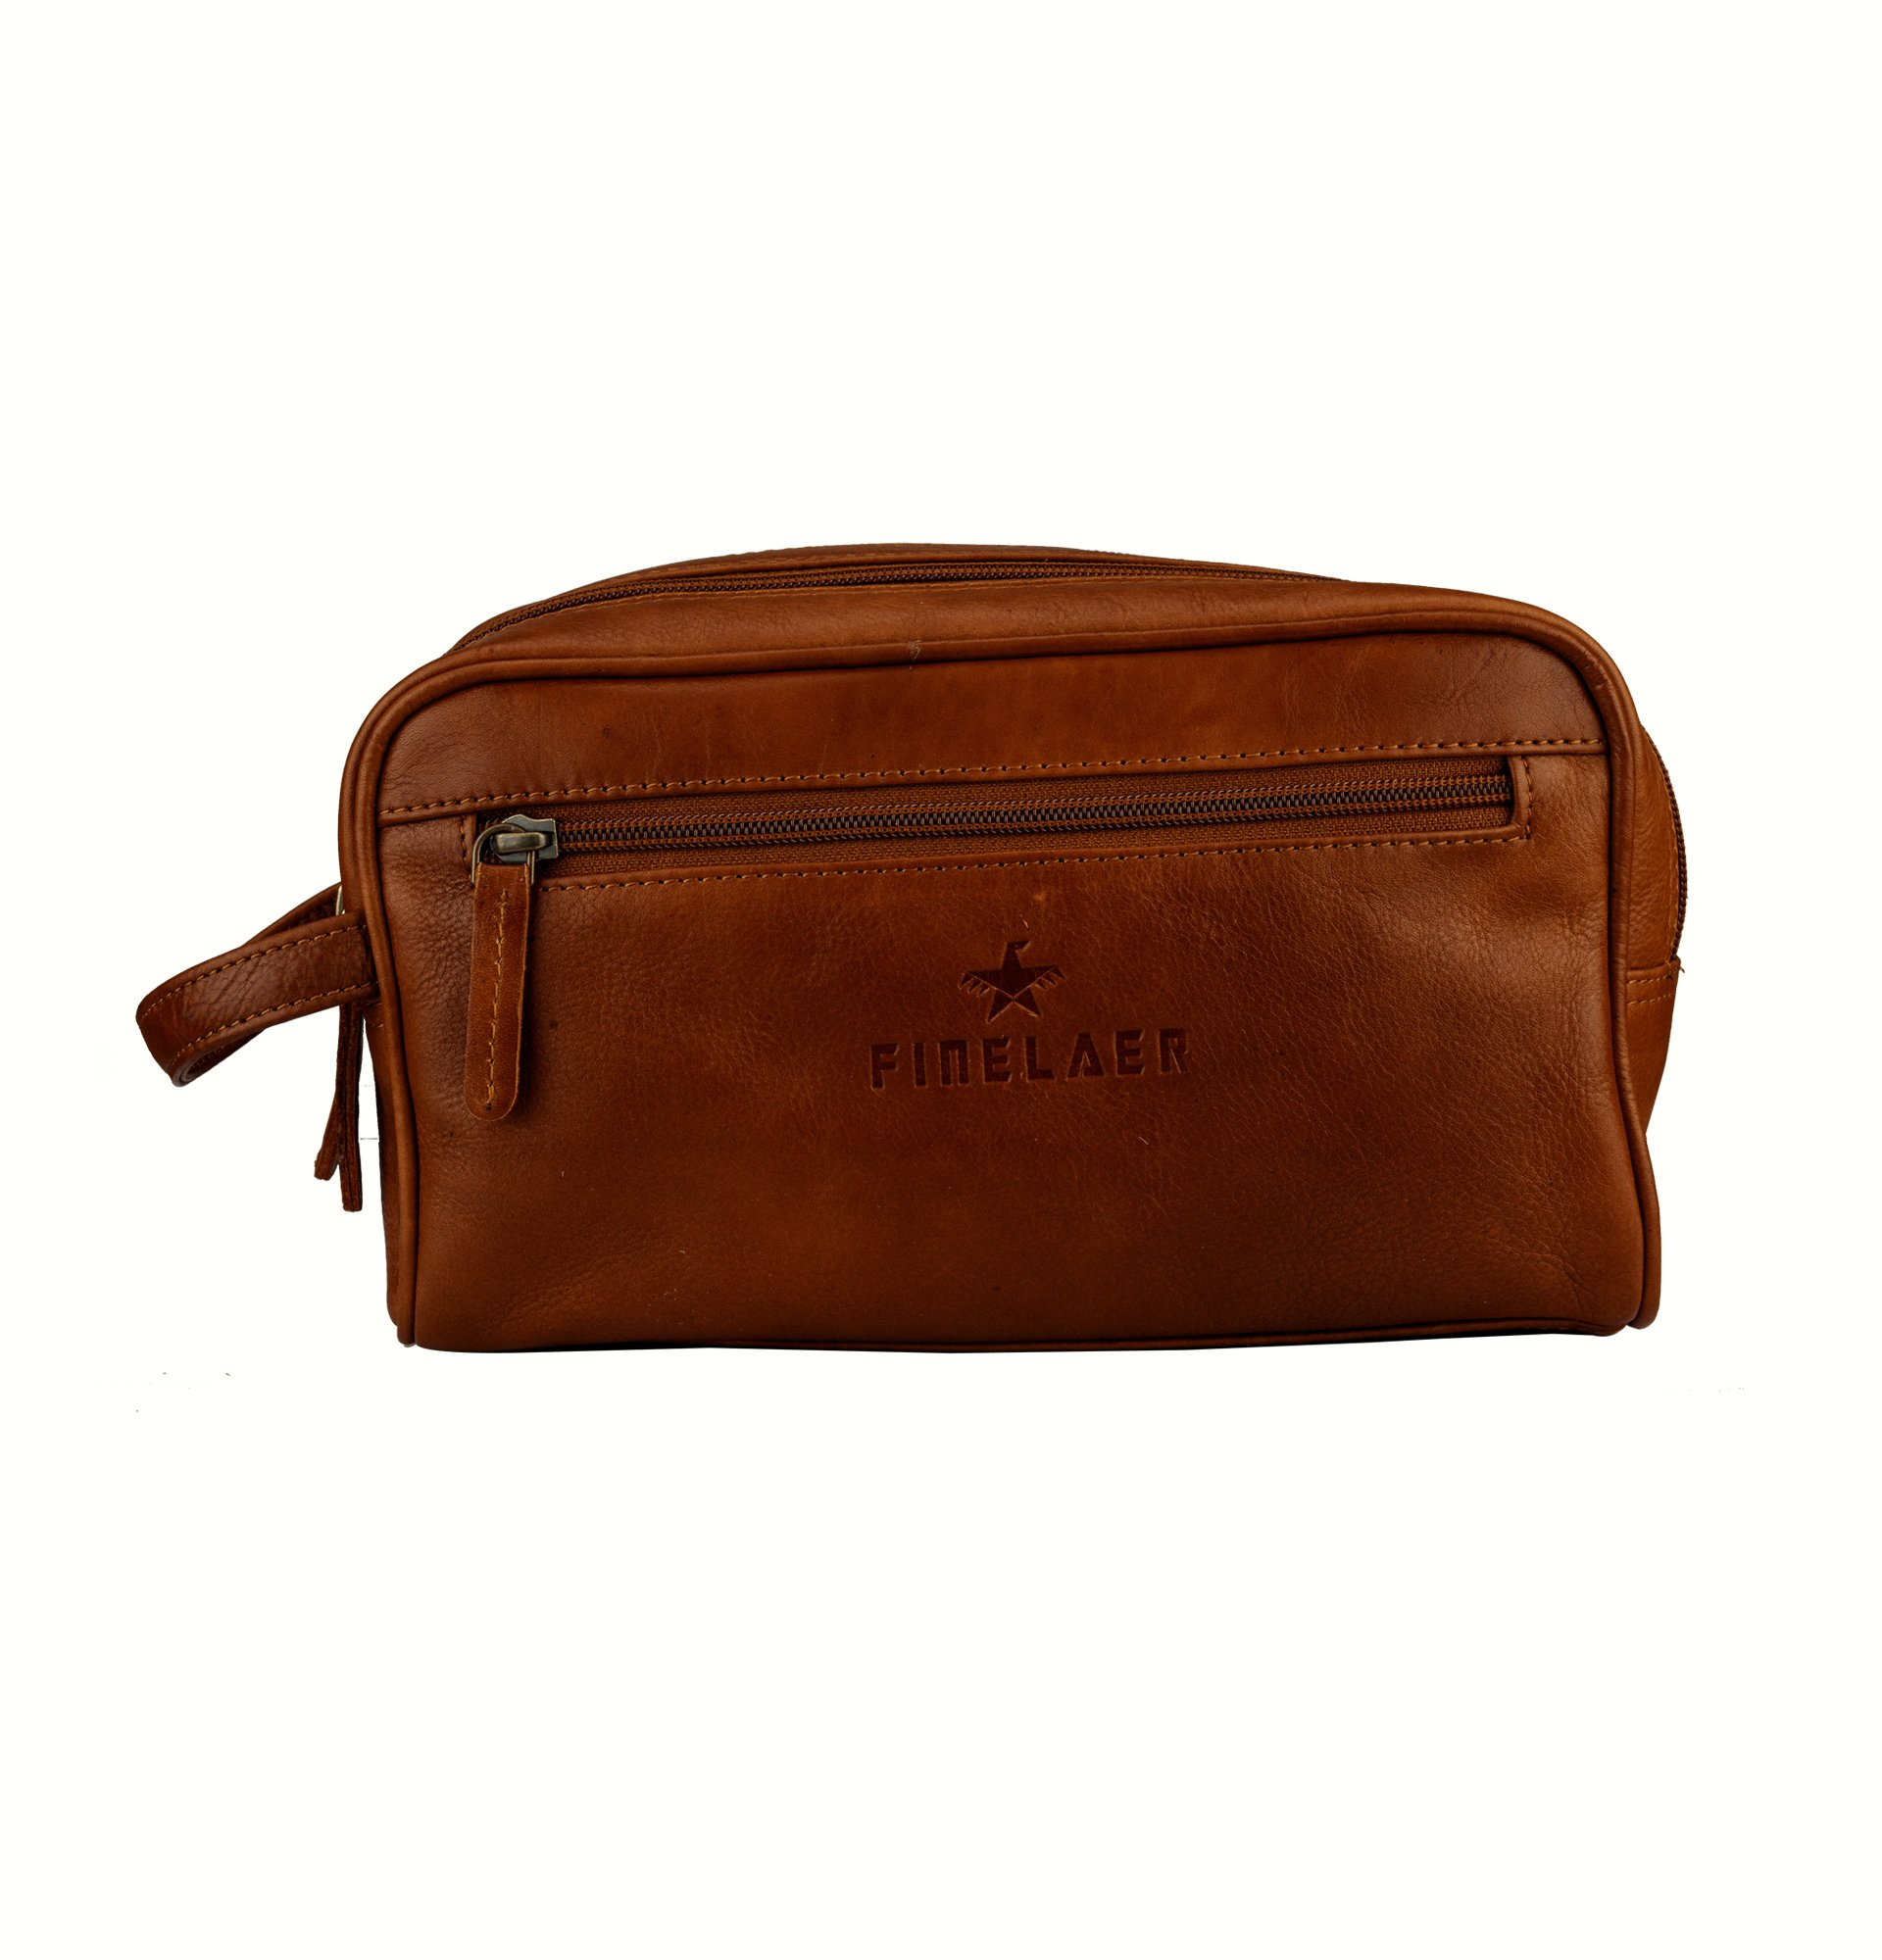 Finelaer Men Brown Leather Toiletry Travel Dopp Bag